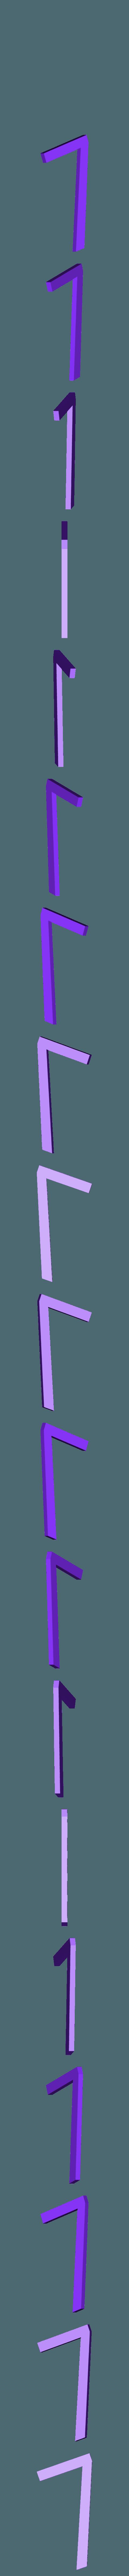 logo_100_7.stl Download free STL file iPhone6 case • Design to 3D print, tofuji